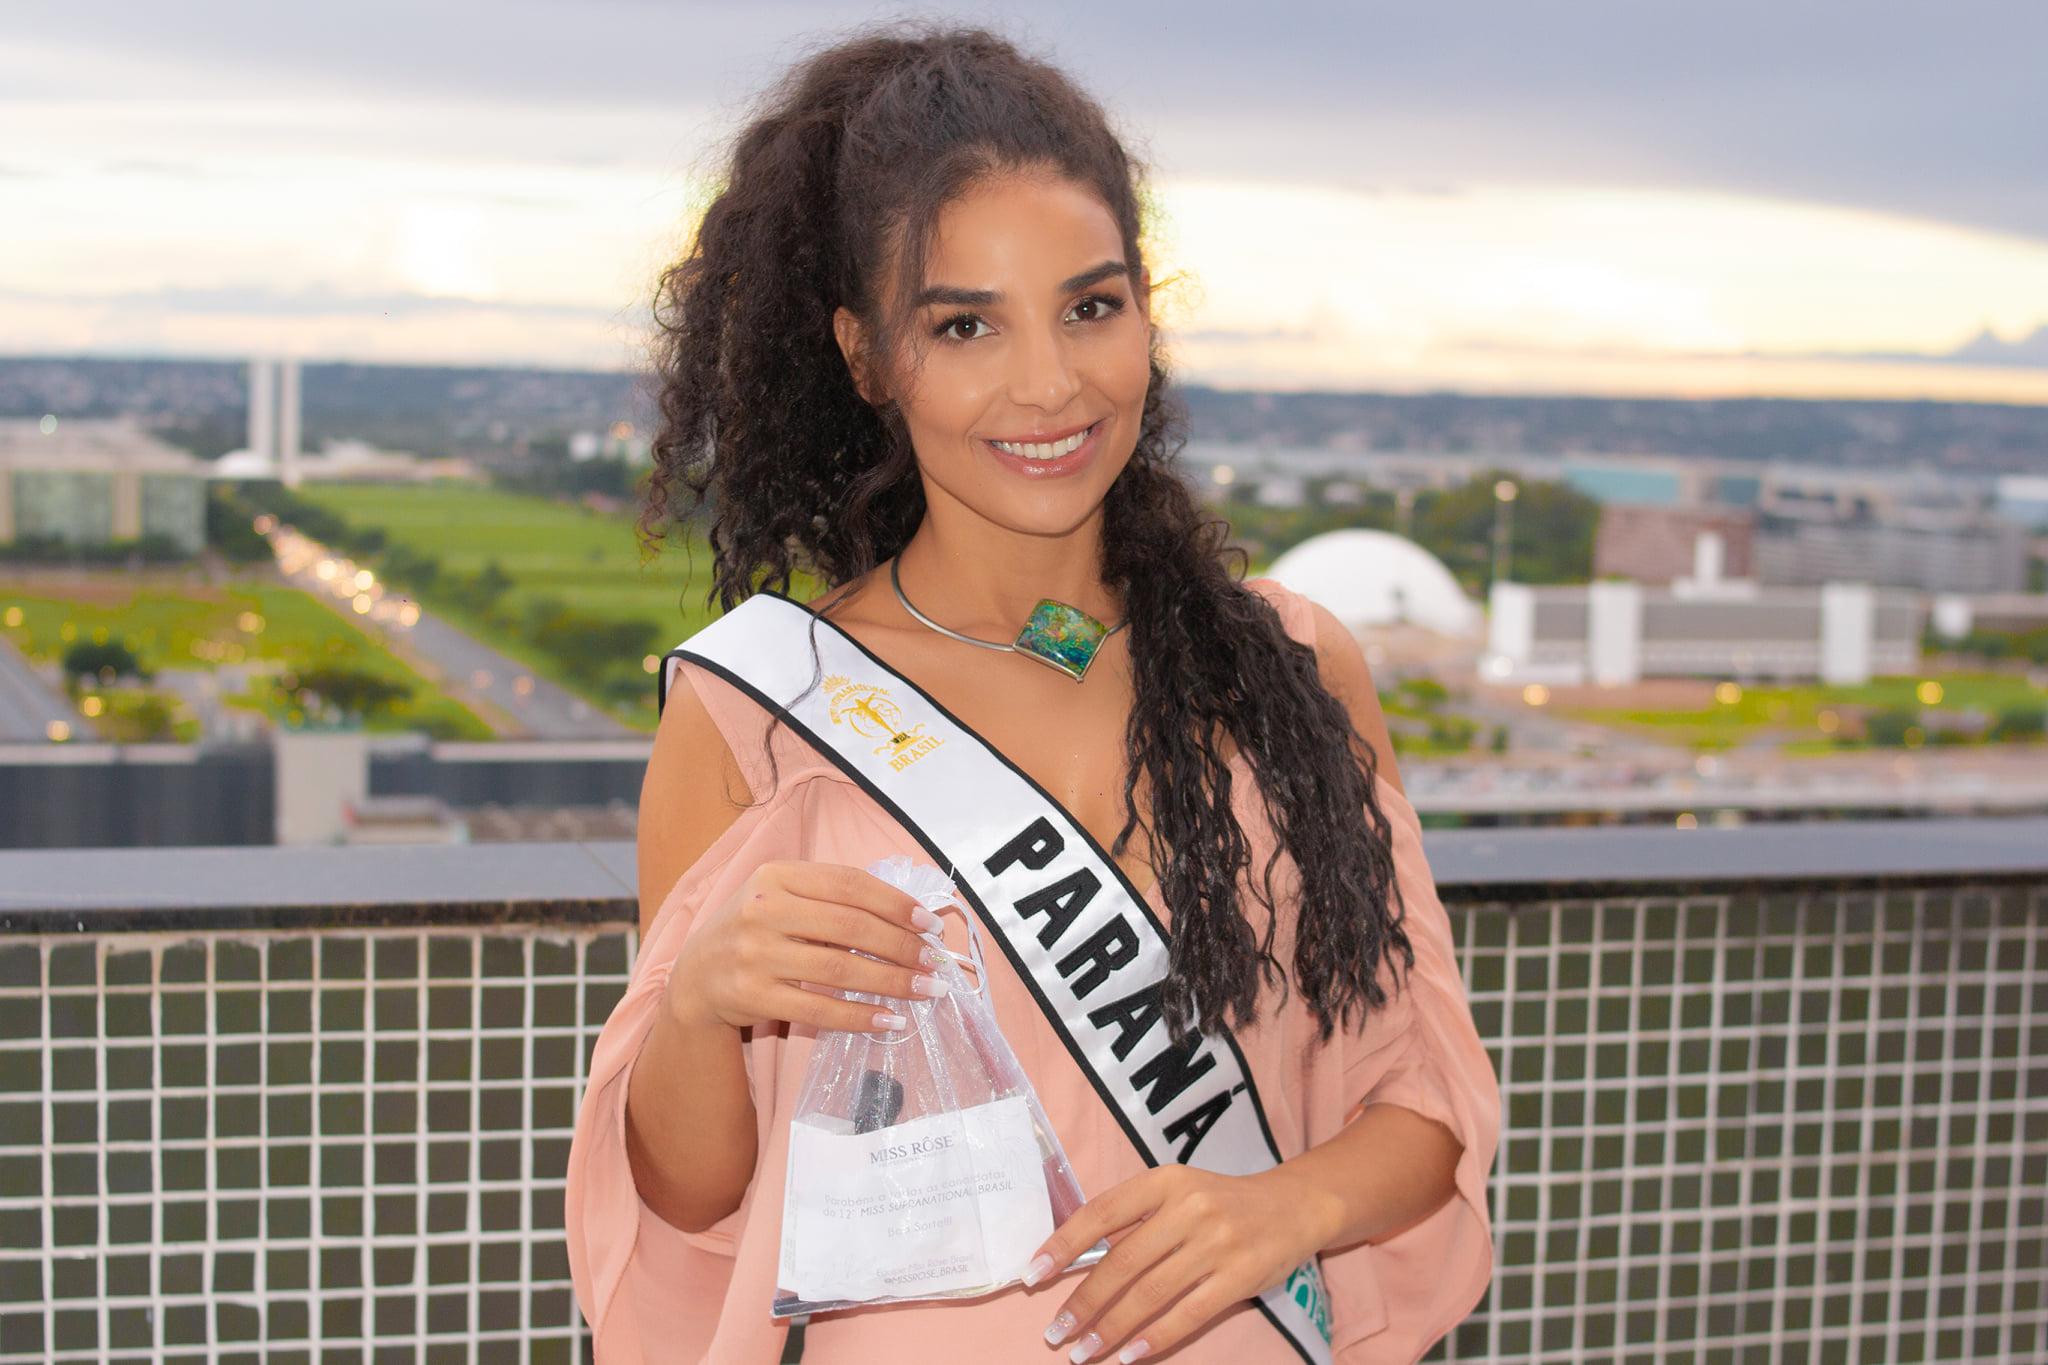 lua paschoalino, miss supranational parana 2020. - Página 4 12791110